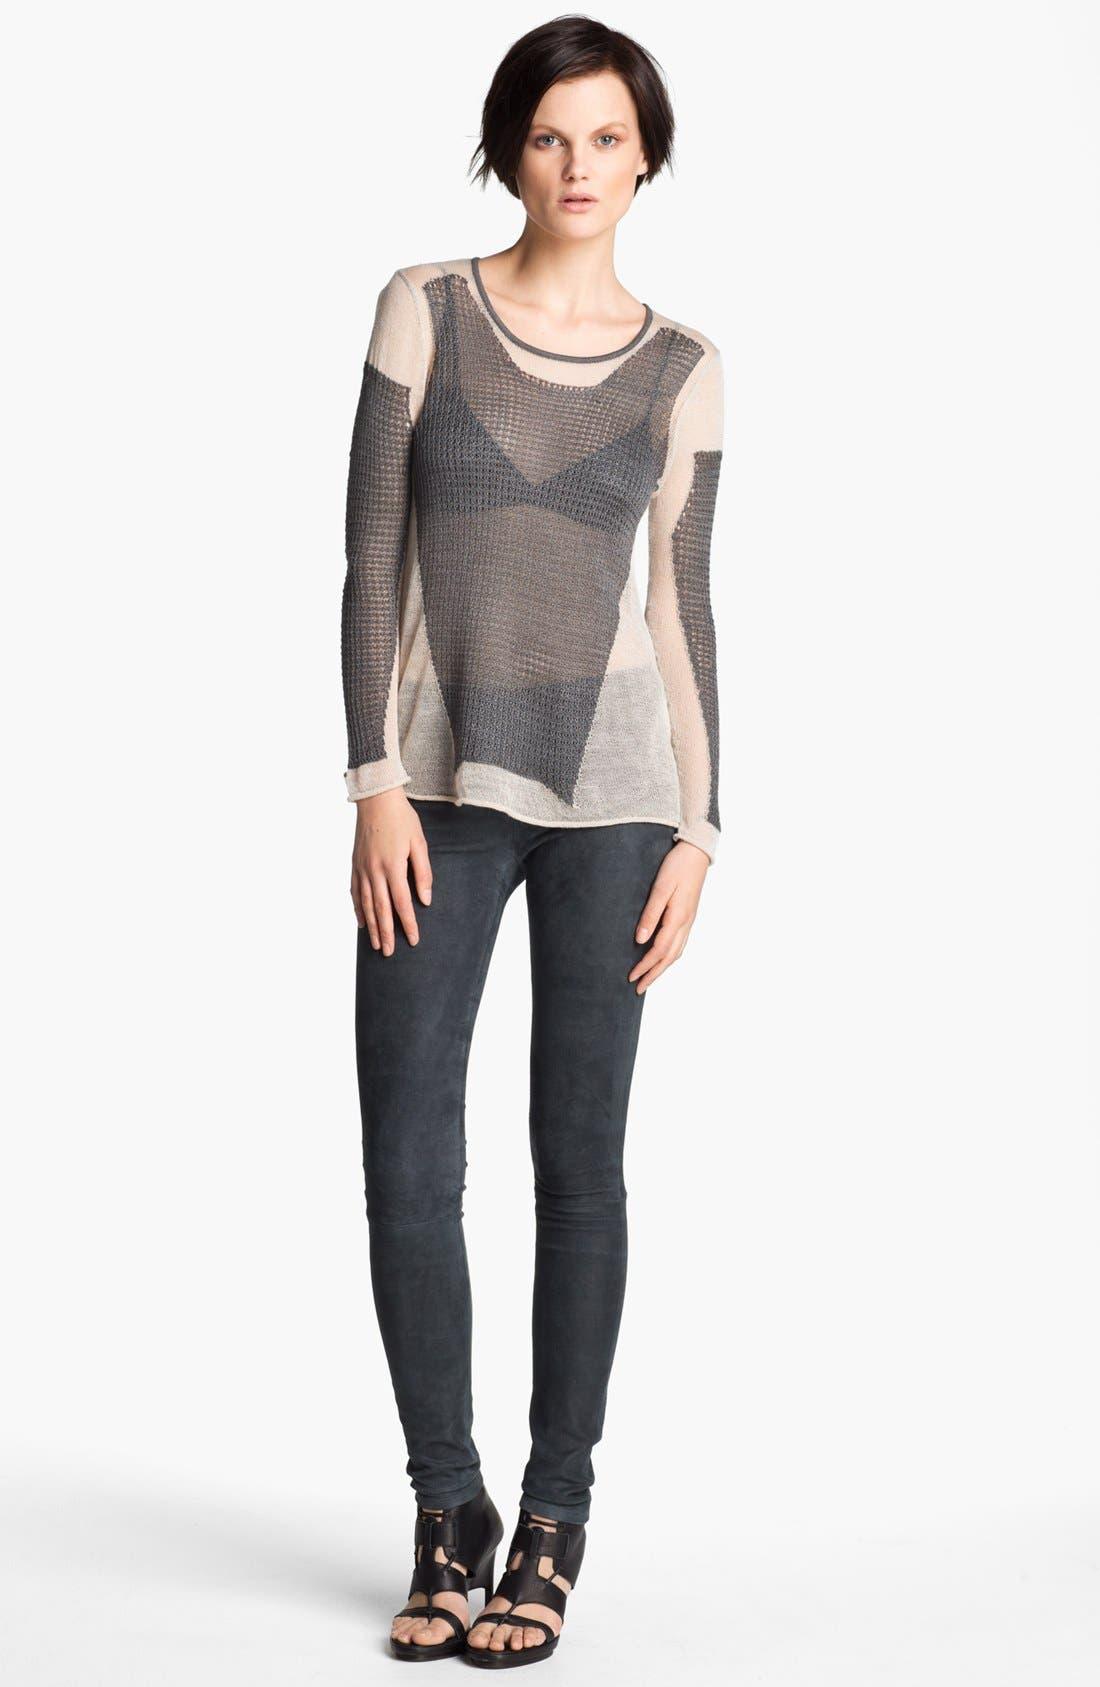 Alternate Image 1 Selected - Helmut Lang 'Modern Lace' Pullover